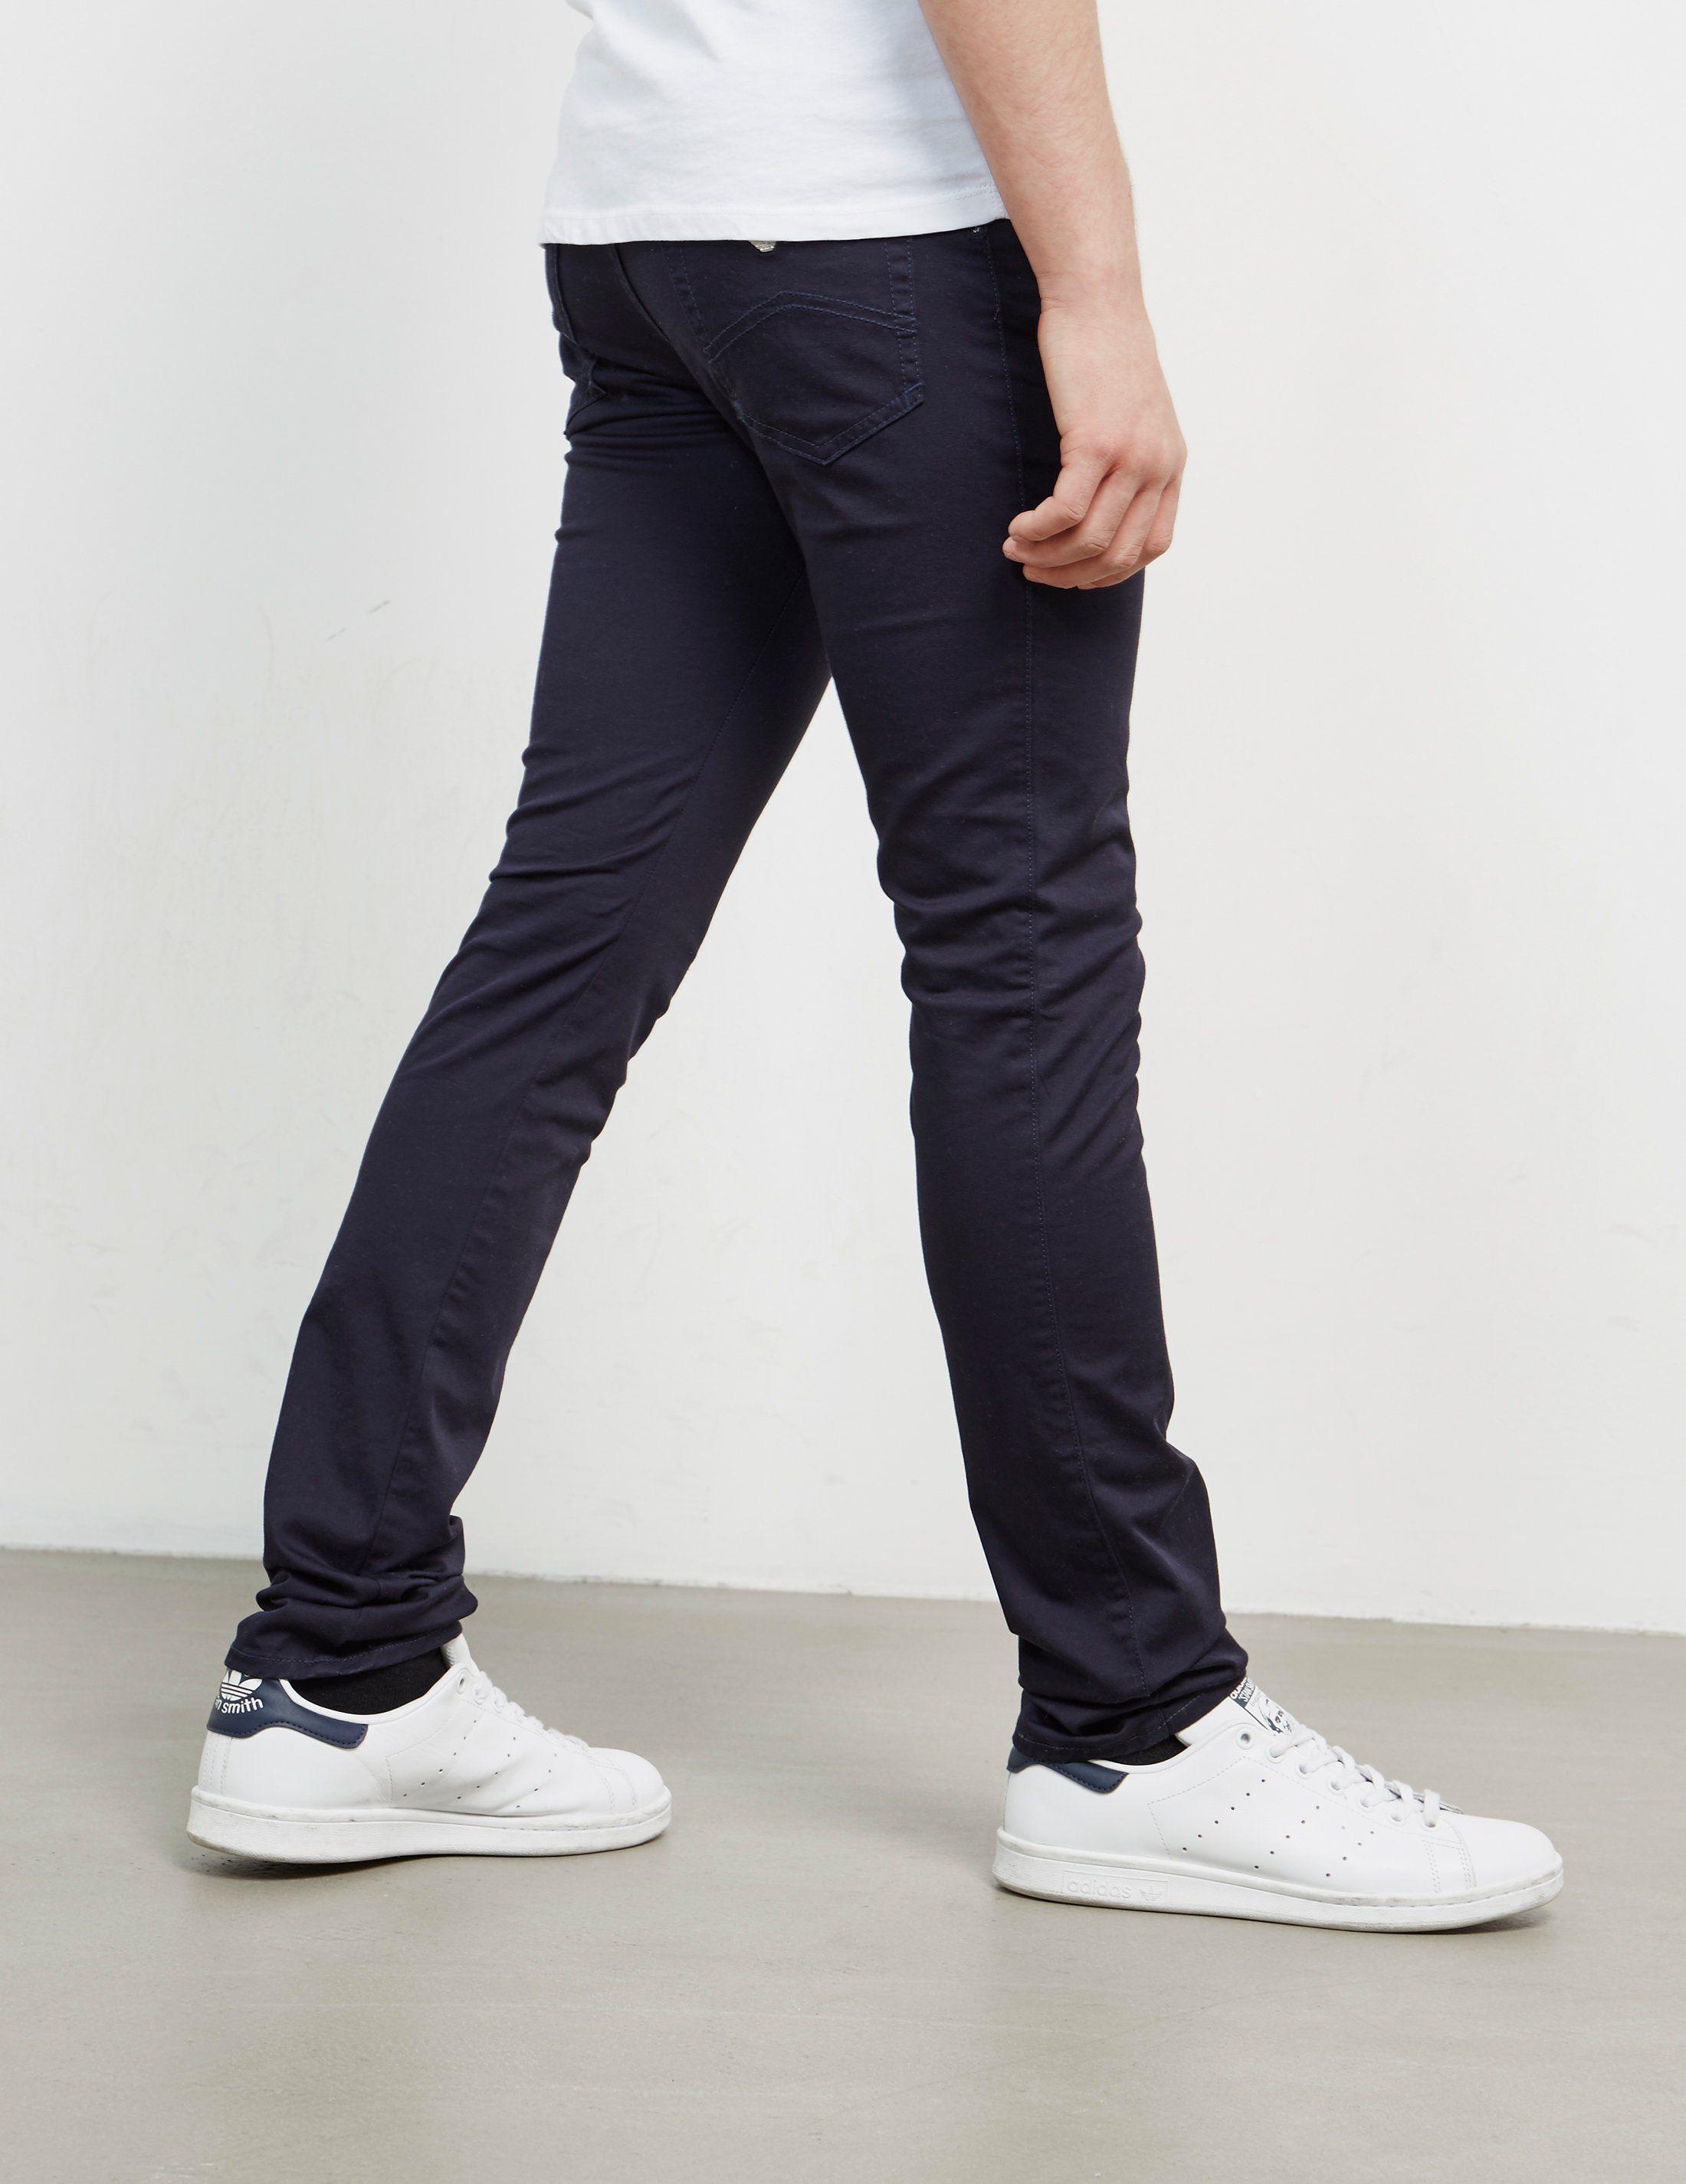 Armani Jeans J15 Slim Jeans